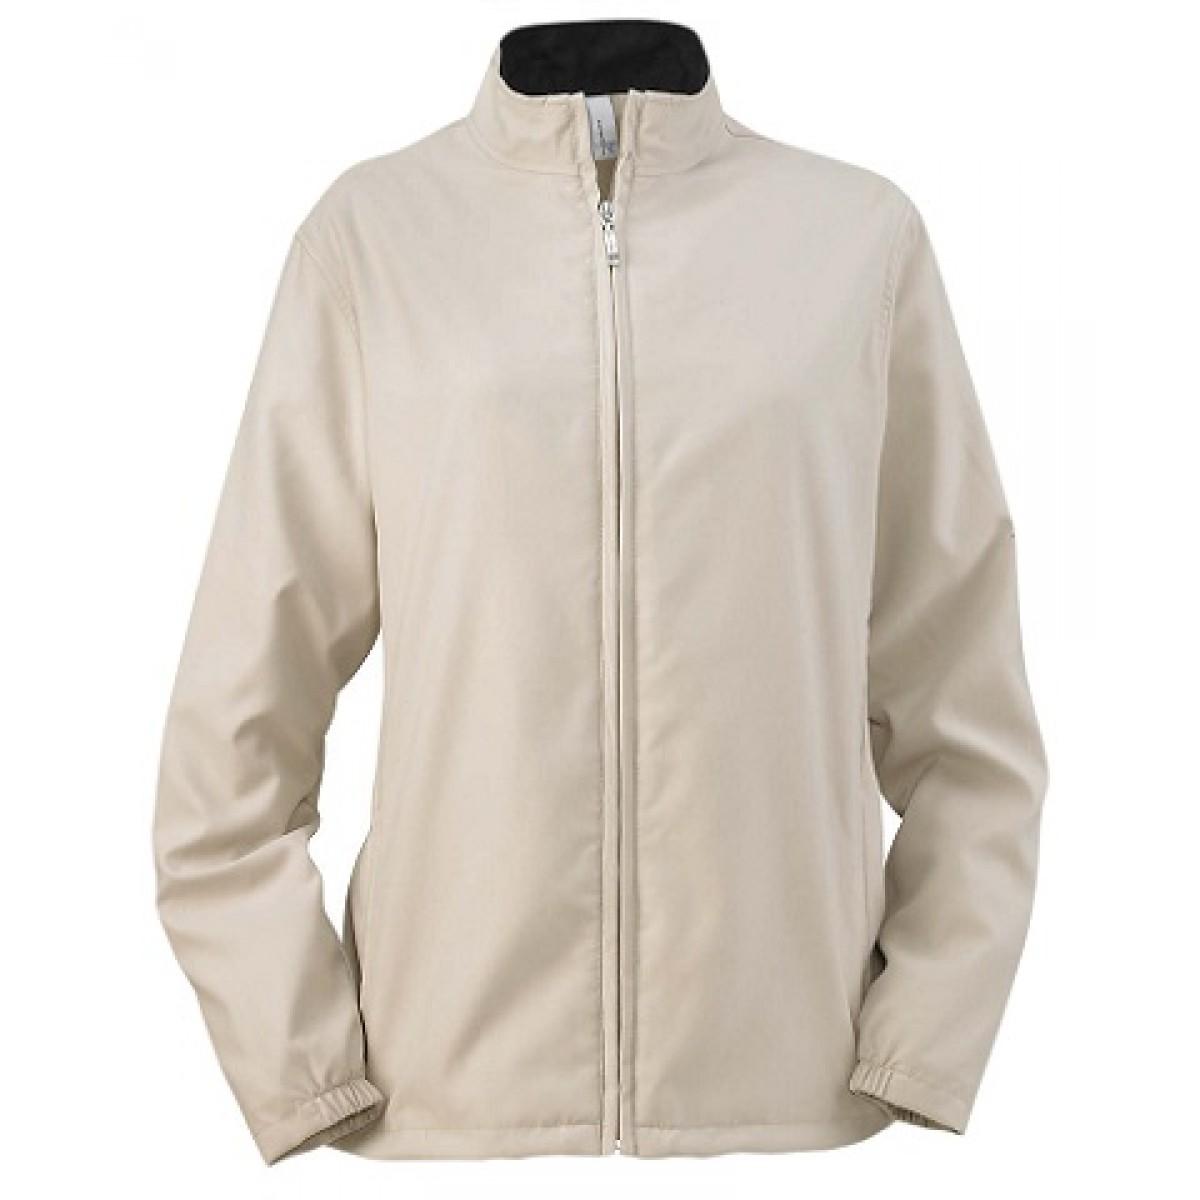 Ladies' Full-Zip Lined Wind Jacket-XL